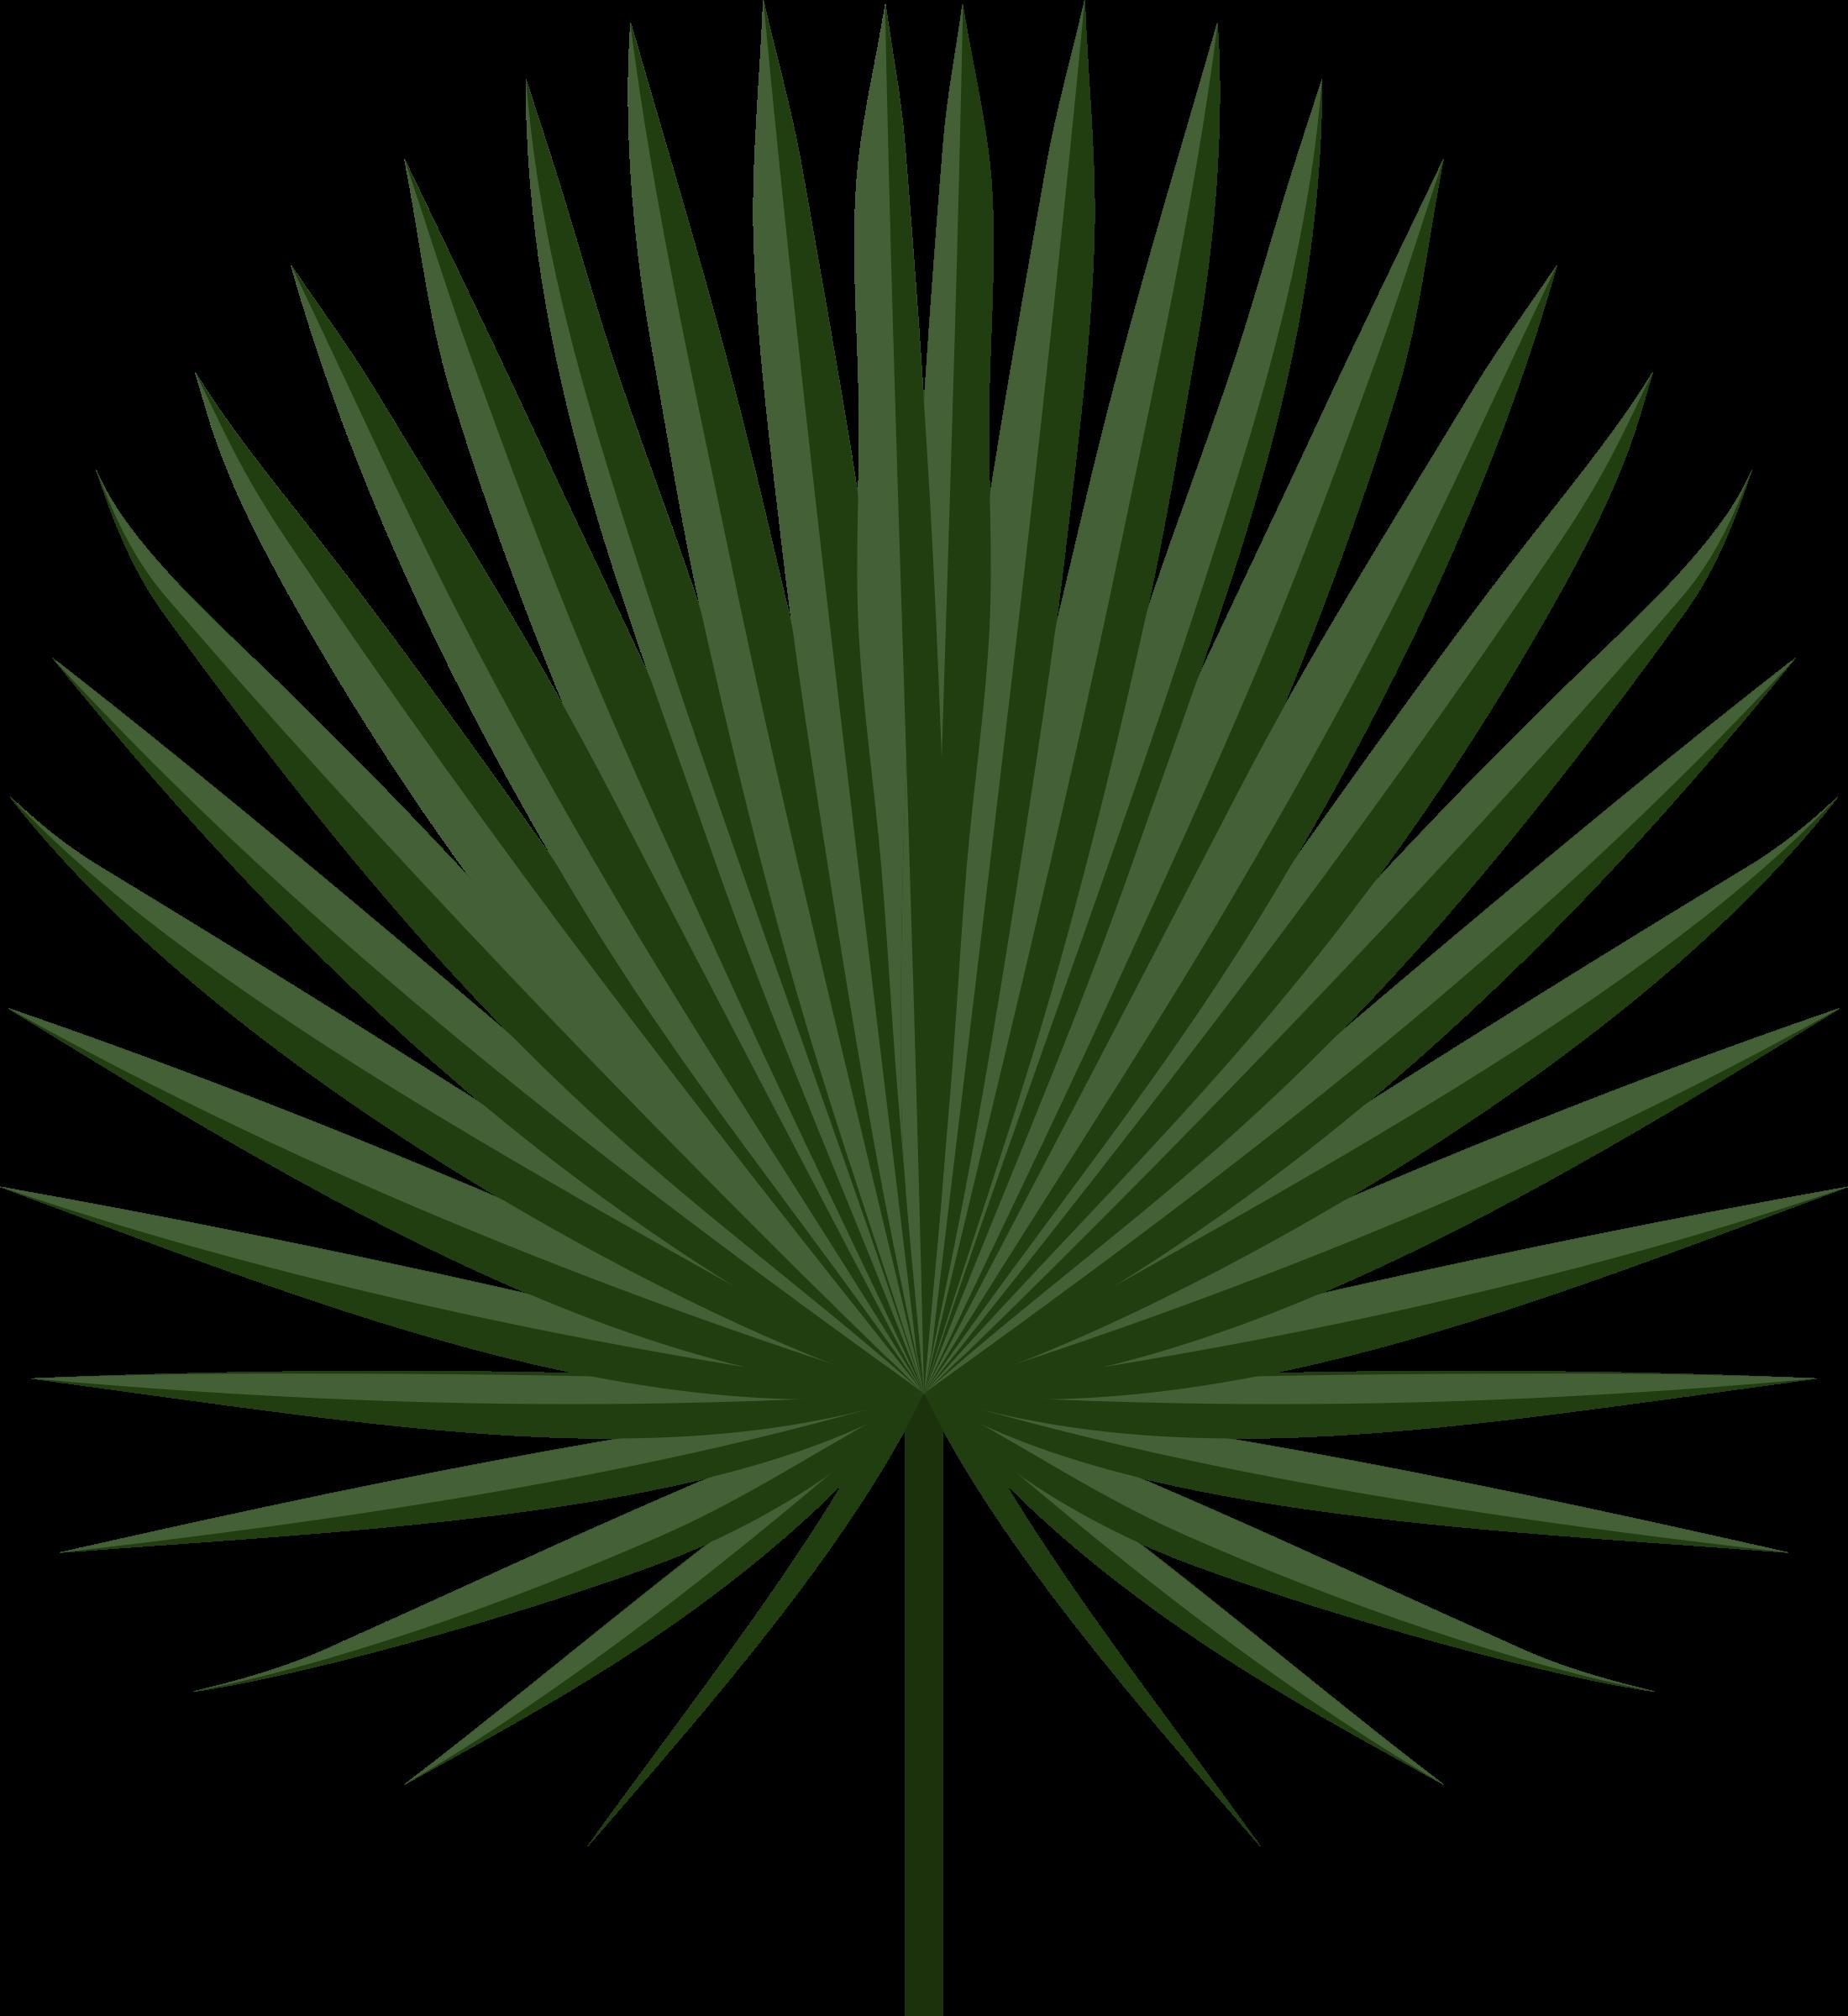 Clipart leaves palm leaves. Sabal leaf big image